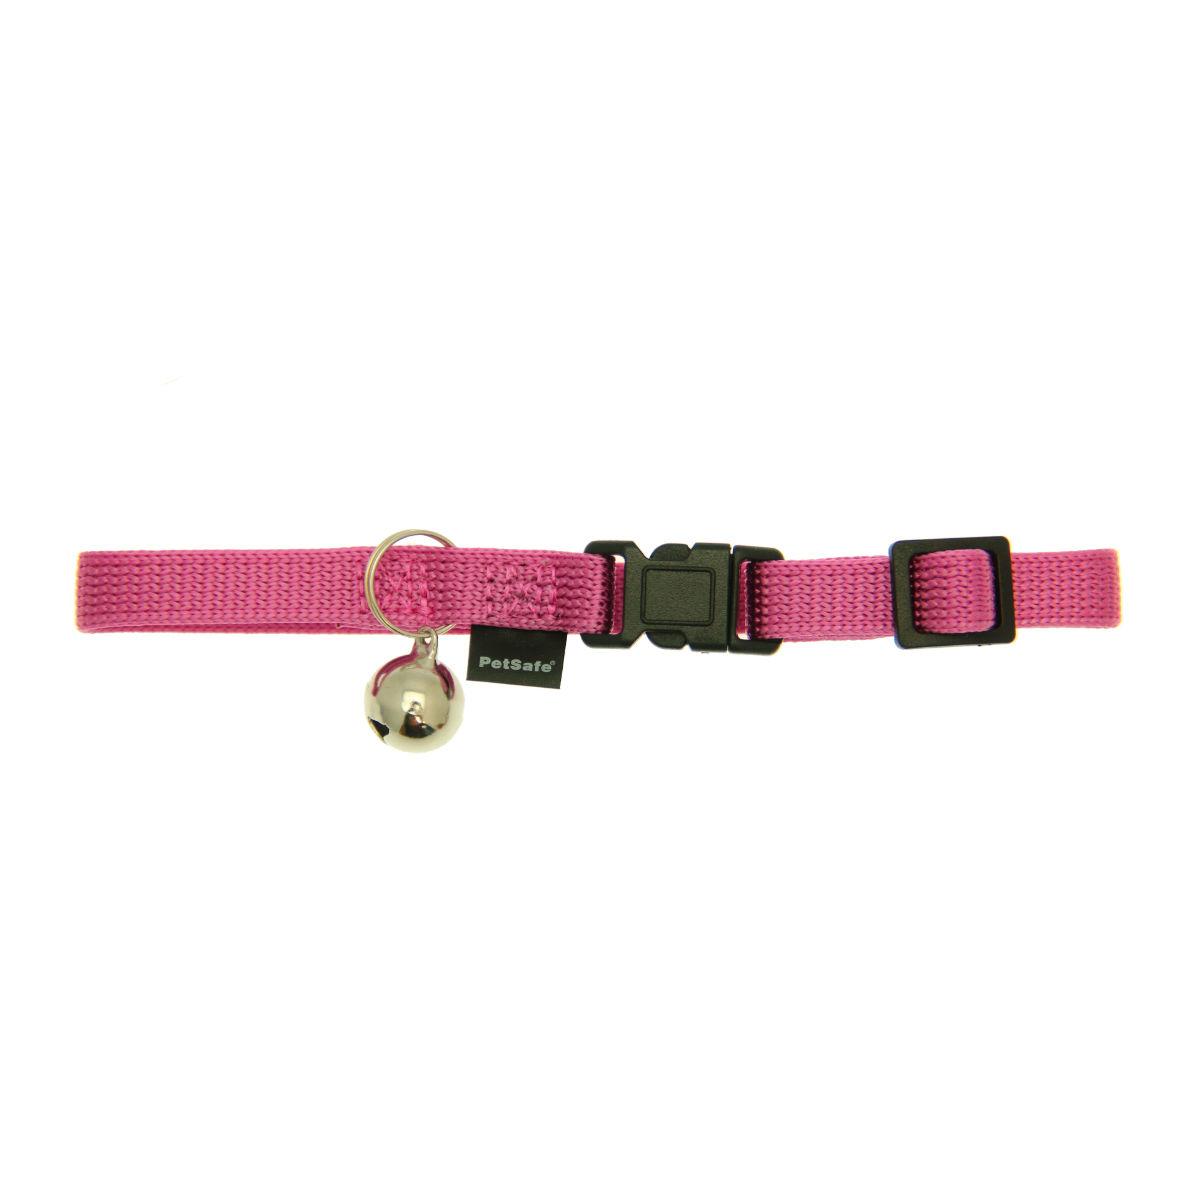 PetSafe Kitty Break-Away Cat Collar - Rose